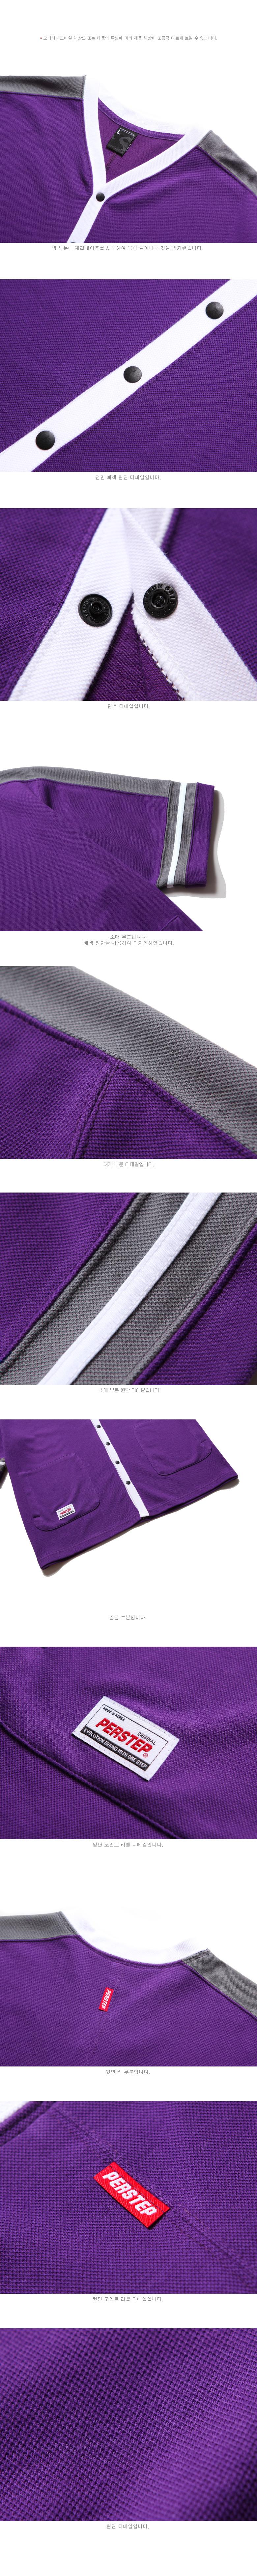 20180509_ps_bridge_purple_uk_02.jpg